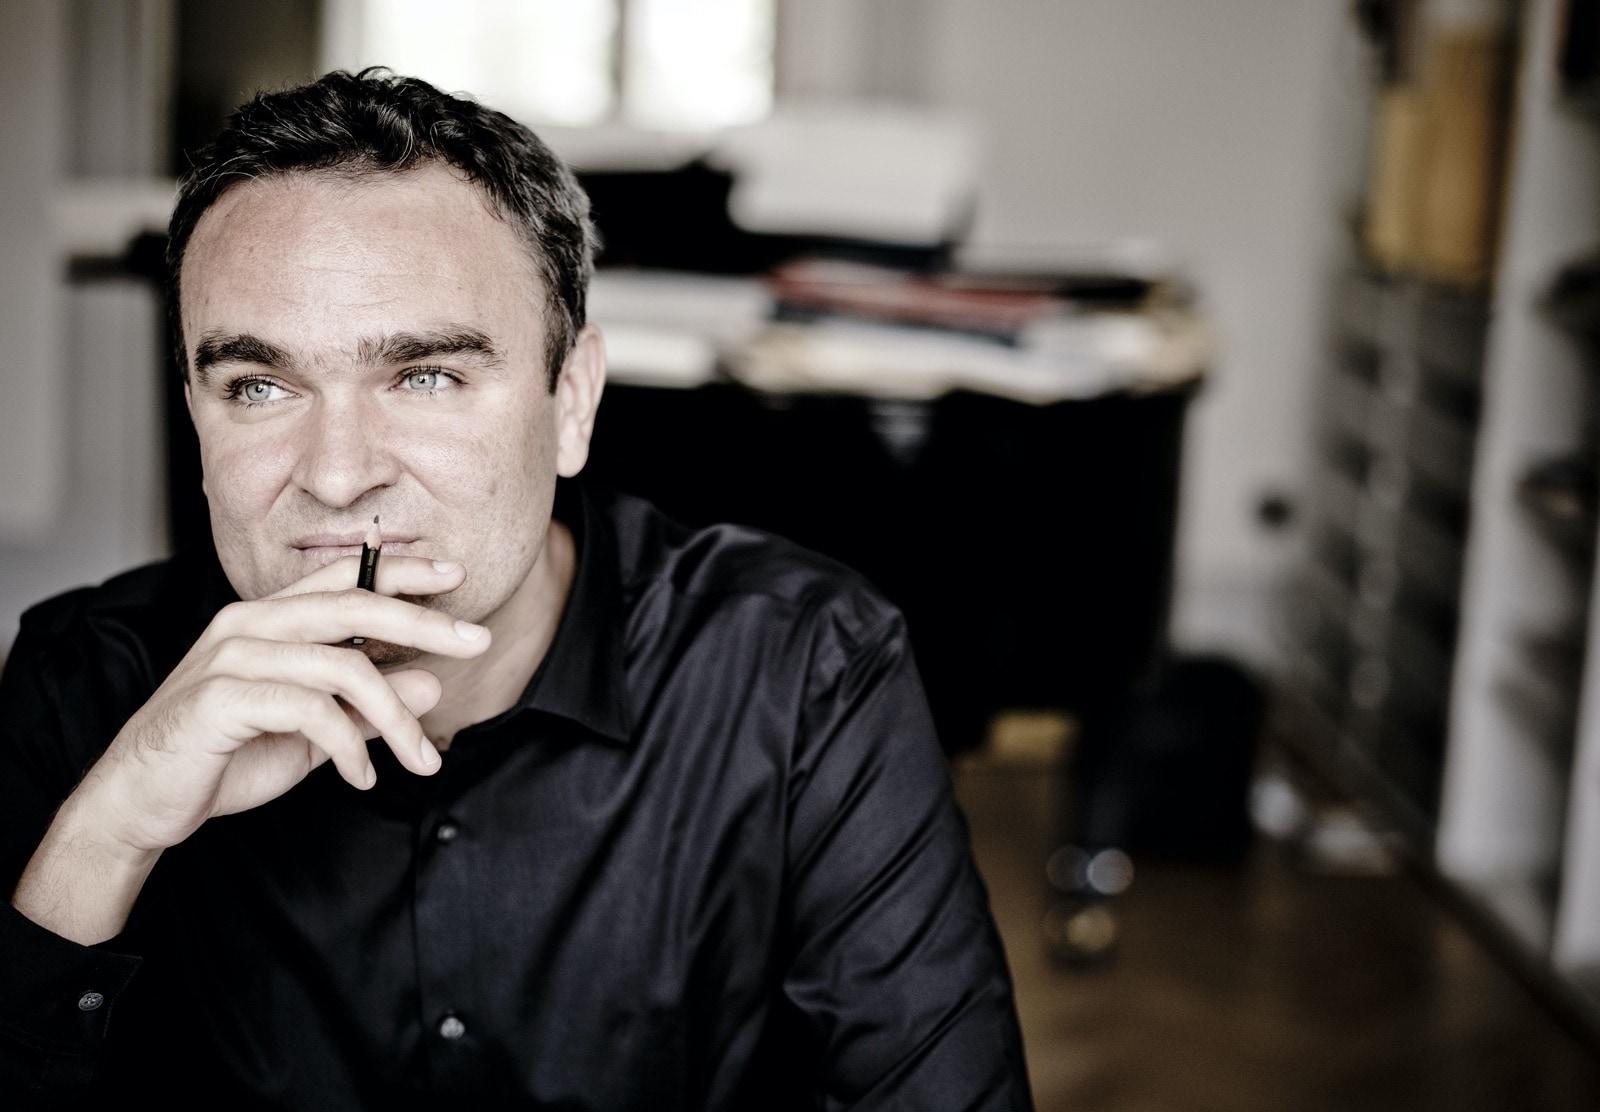 Joerg Widmann Photo: Marco Borggreve